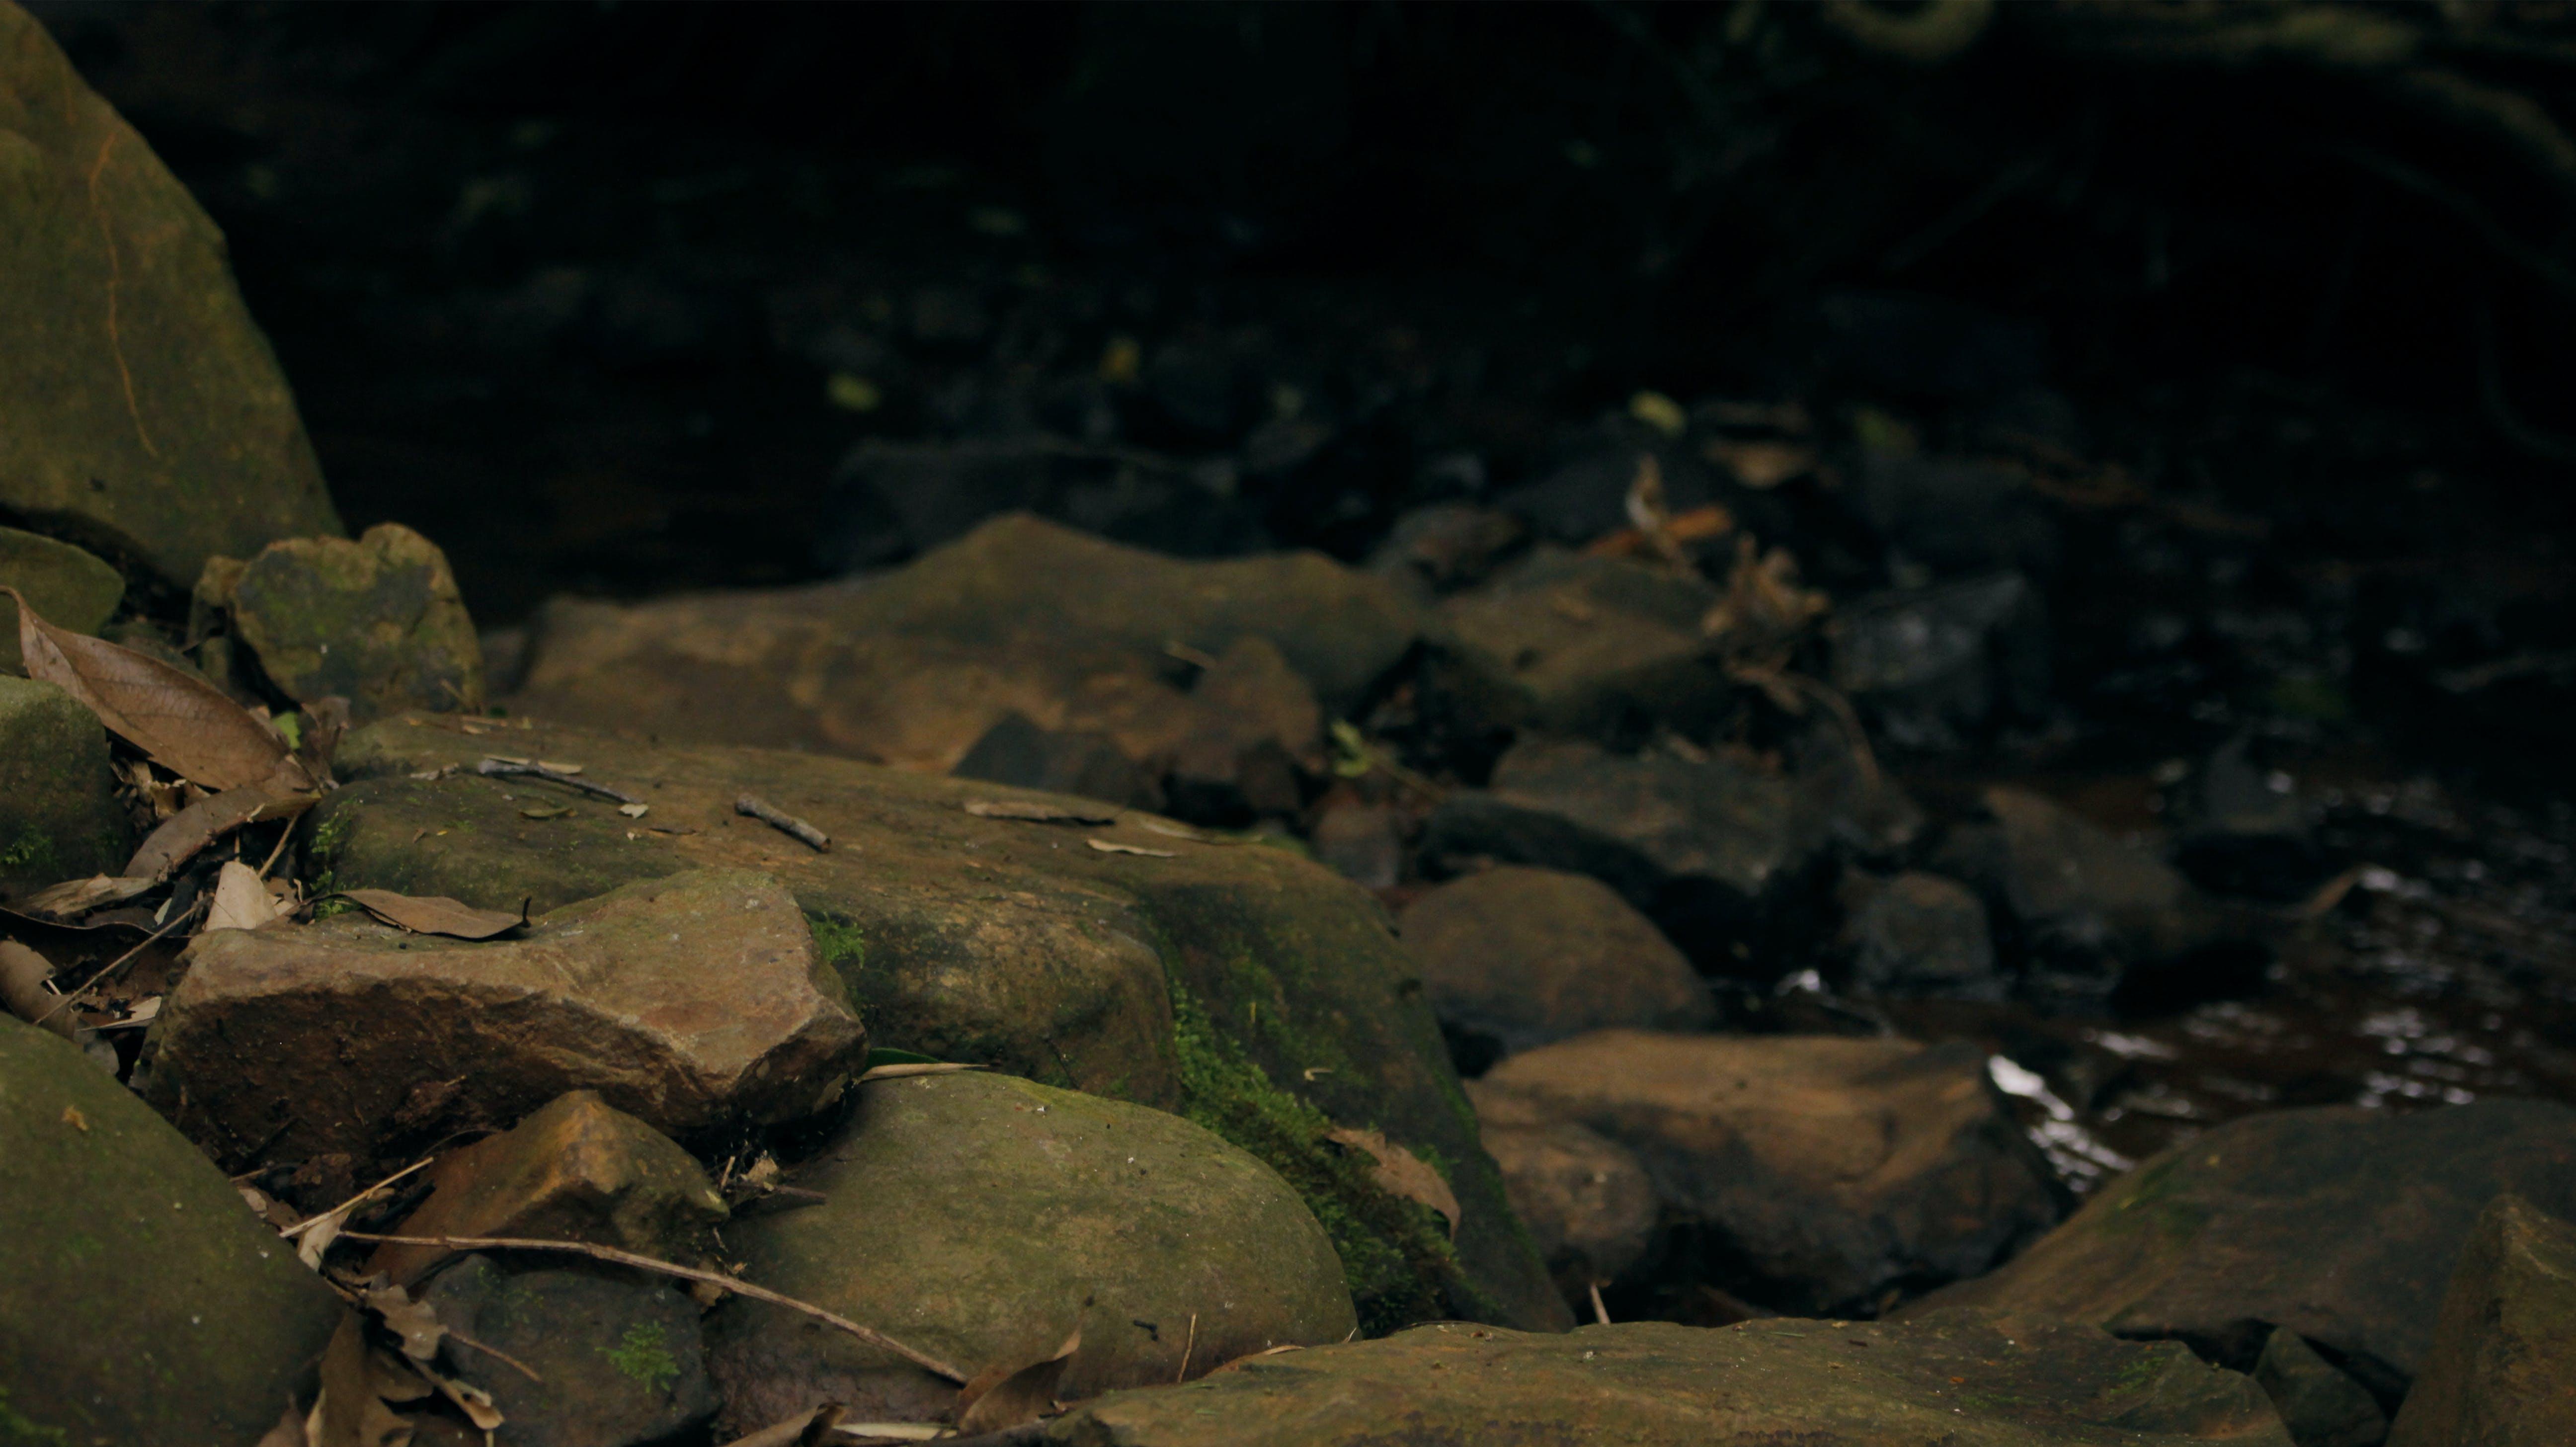 fotografie, grün, natur